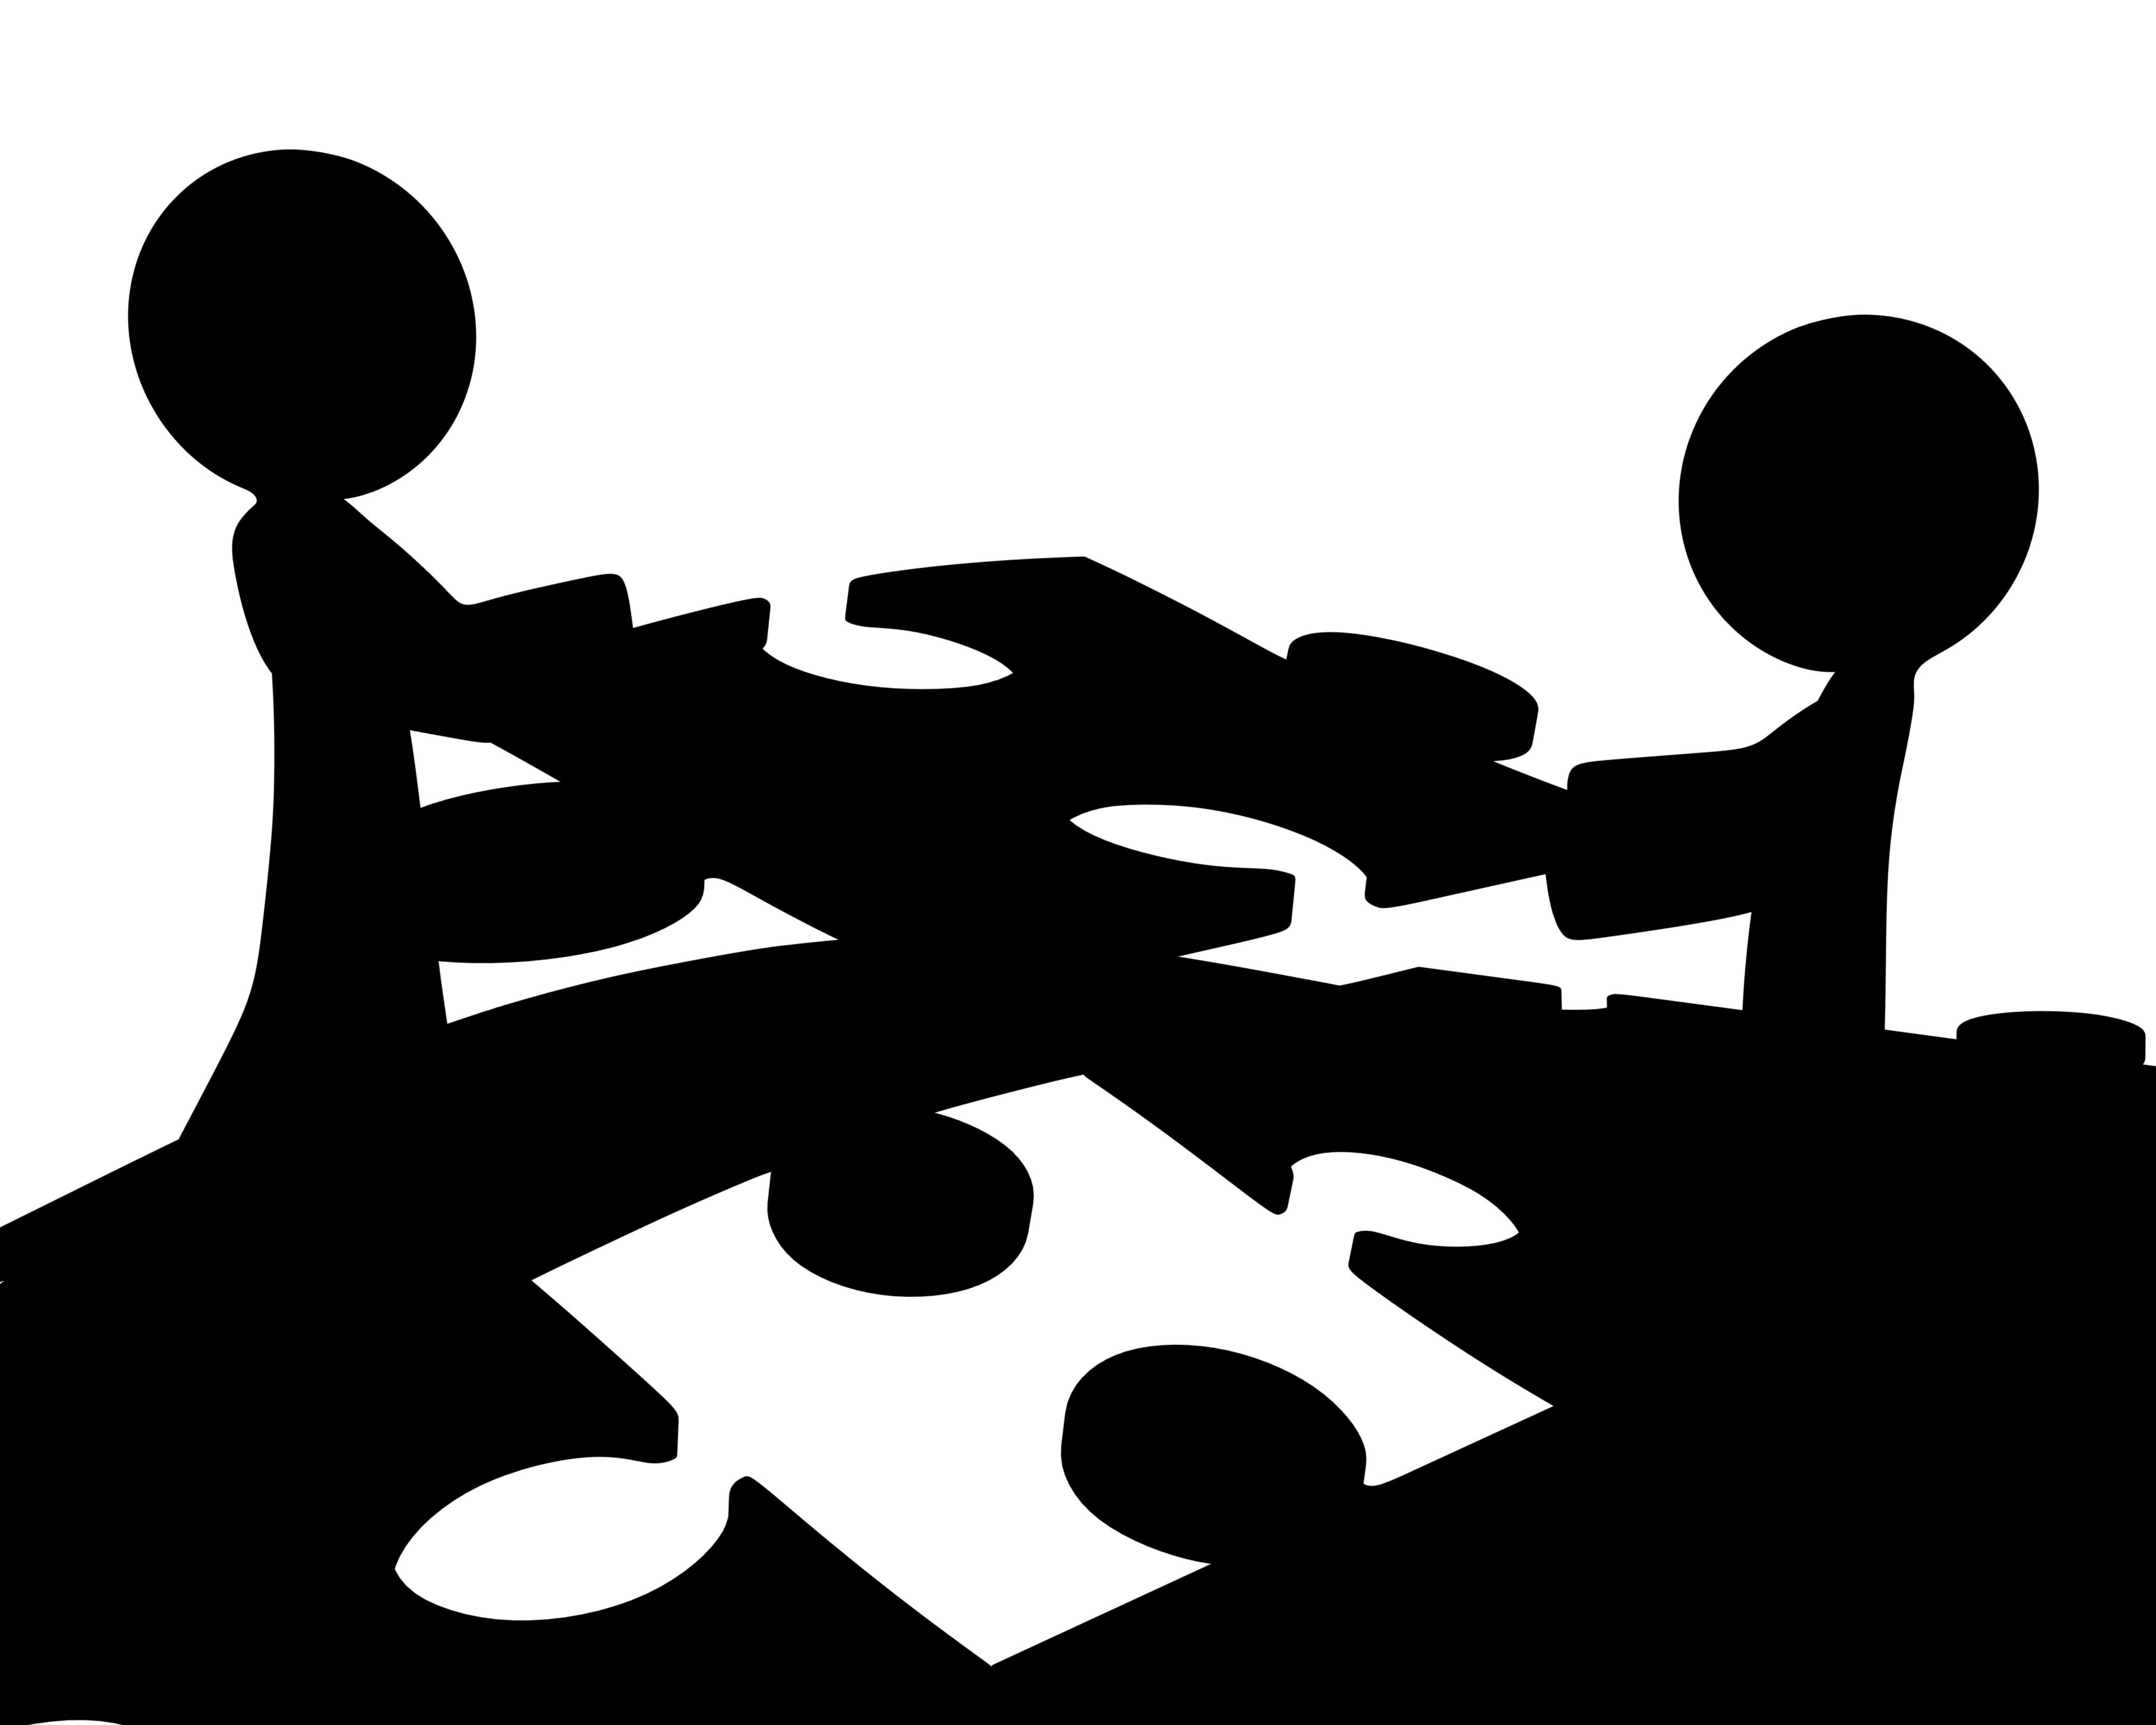 Free image download clip. Teamwork clipart lack